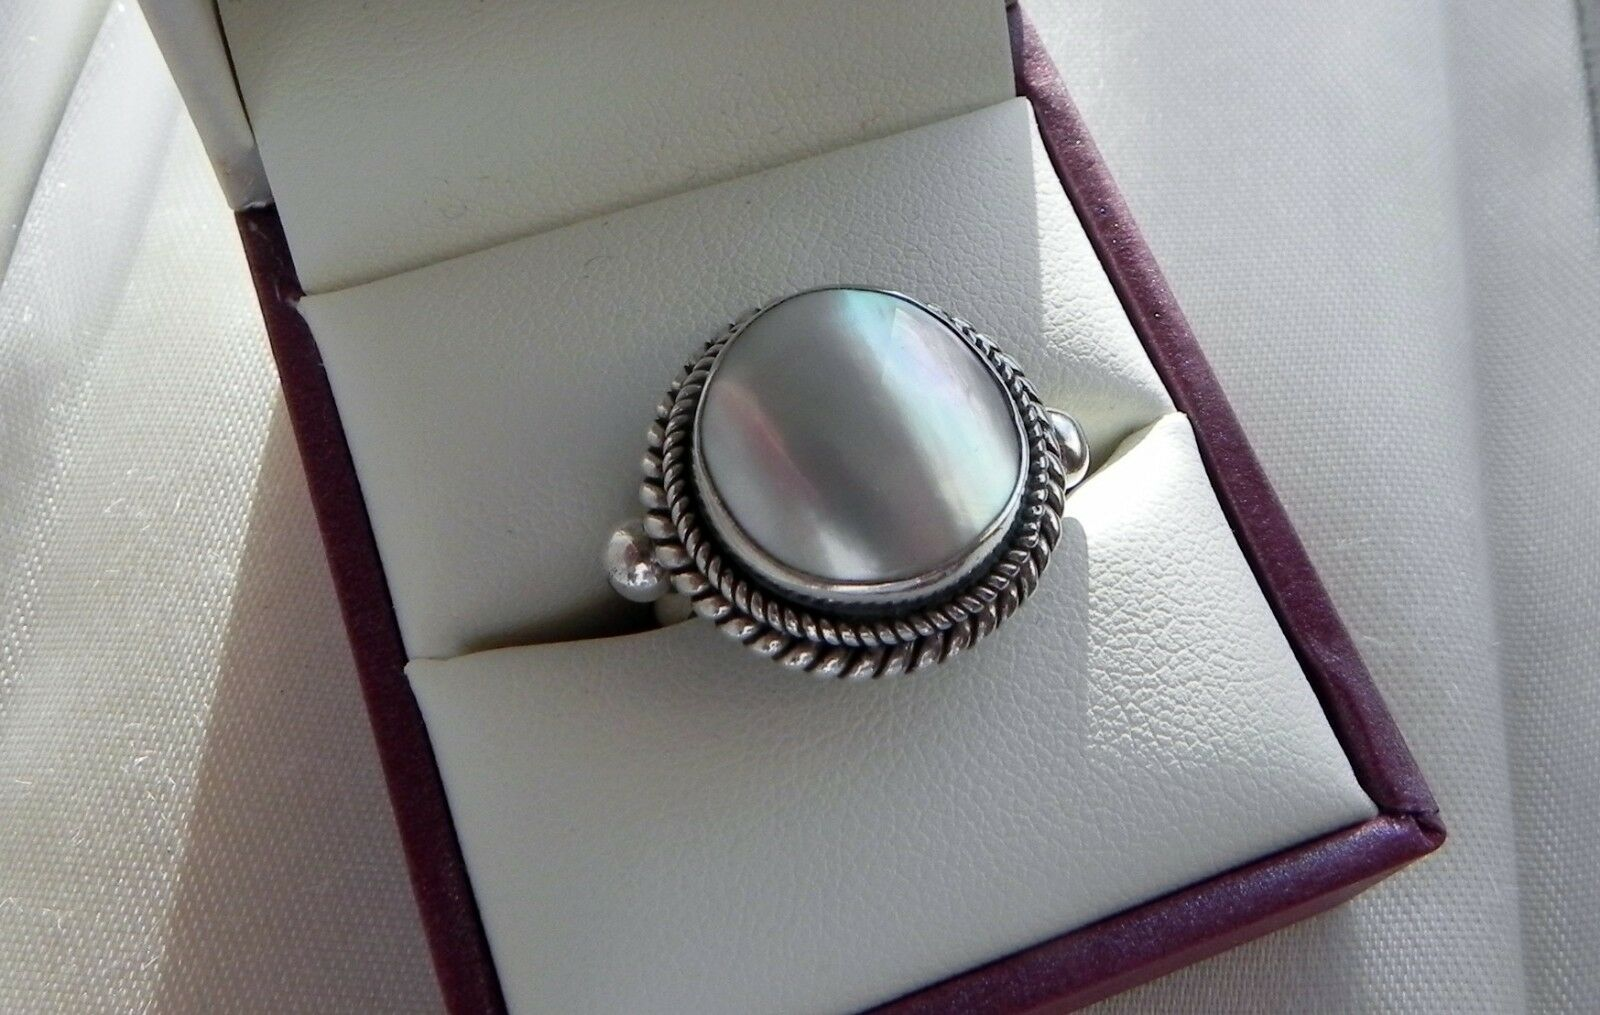 Divine  Large Bali BA 925 9g iridescent cabochon MOP ring size O (US 7.25)